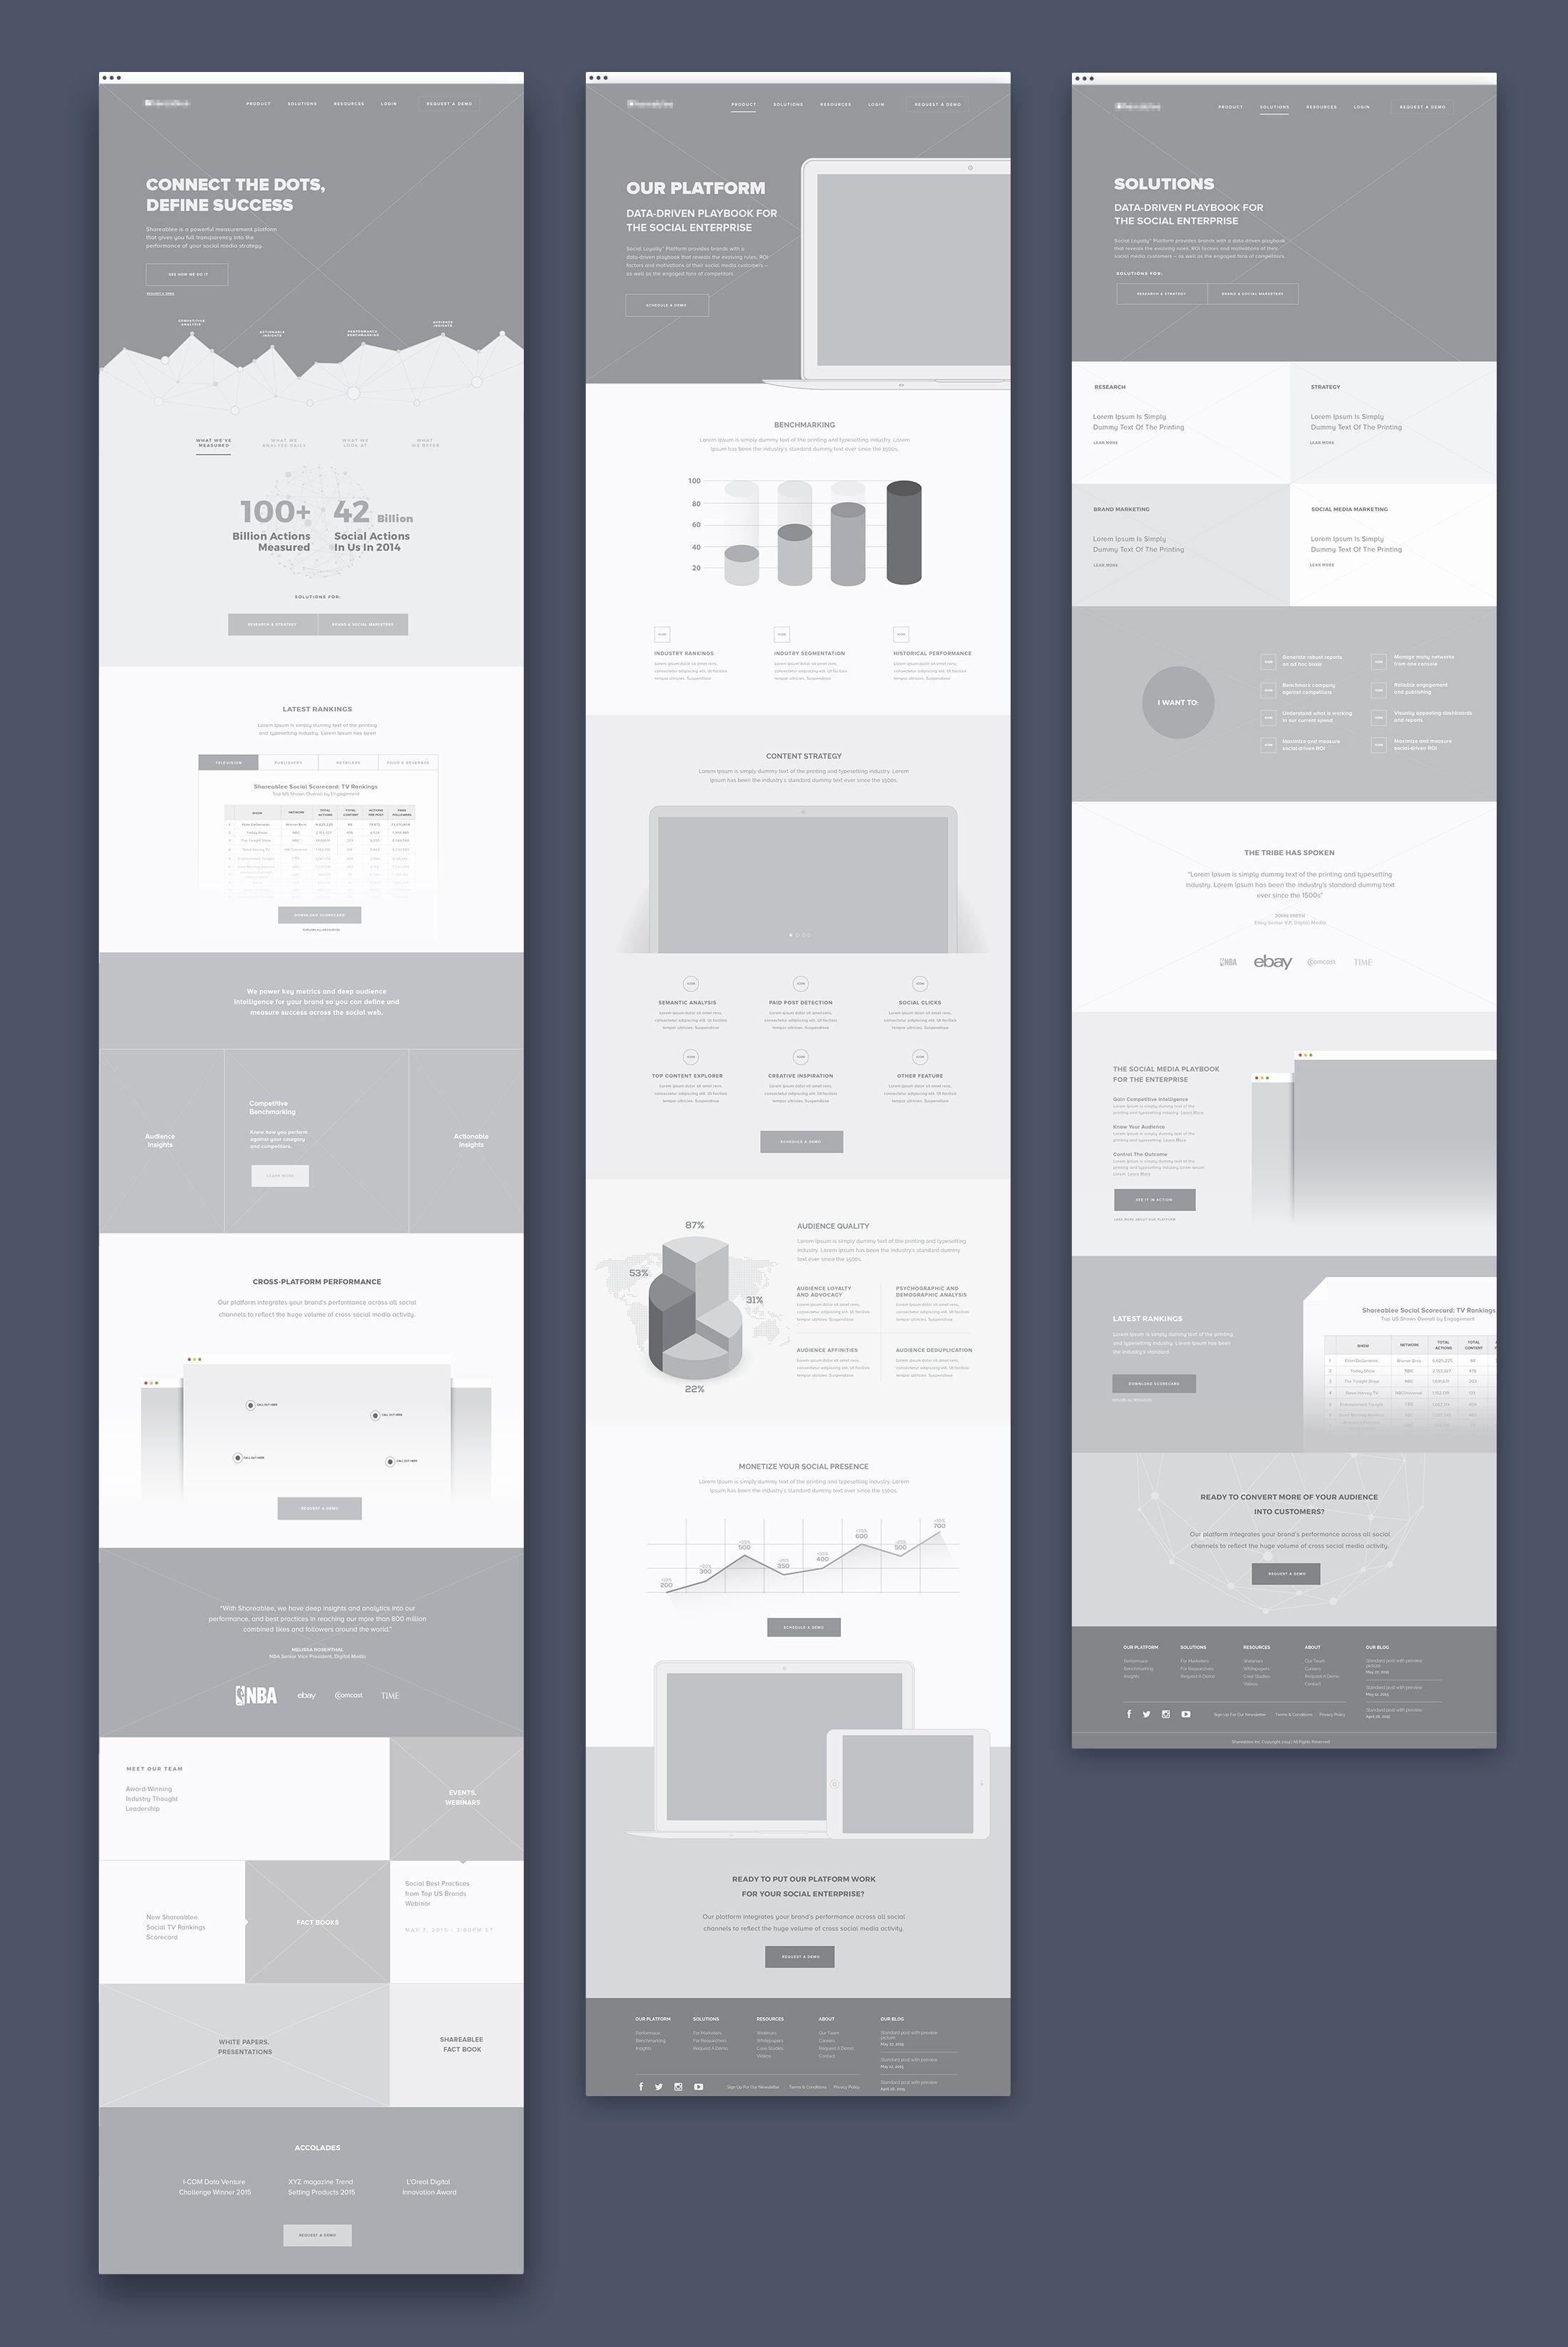 Sports Web Site Template Beautiful Best 25 Website Wireframe Ideas On Pinterest